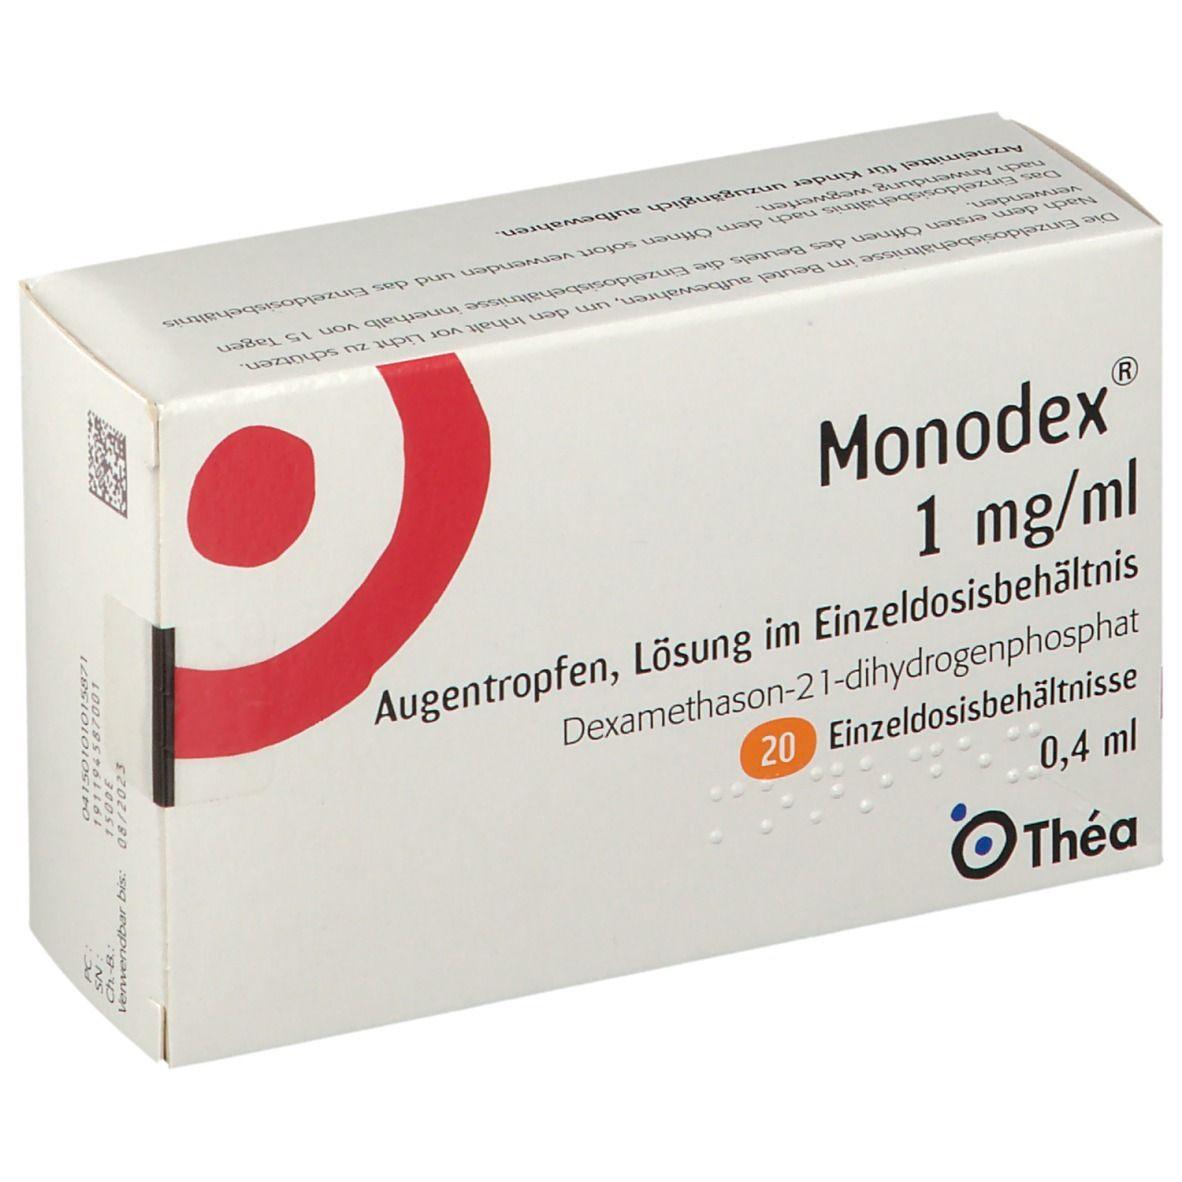 MONODEX 1MG/ML AUGENTROPF